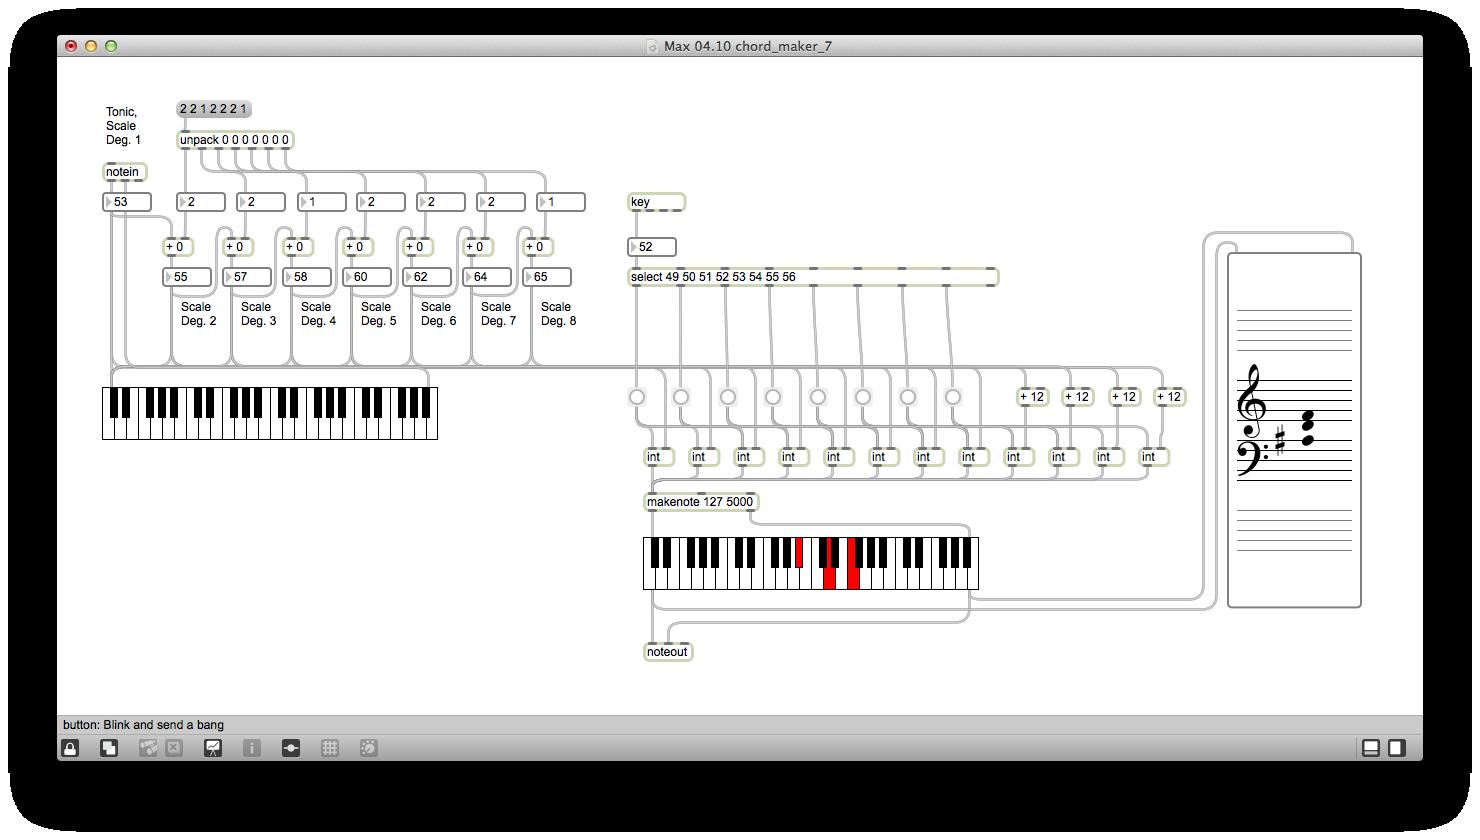 max-04-10-chord_maker_7.png